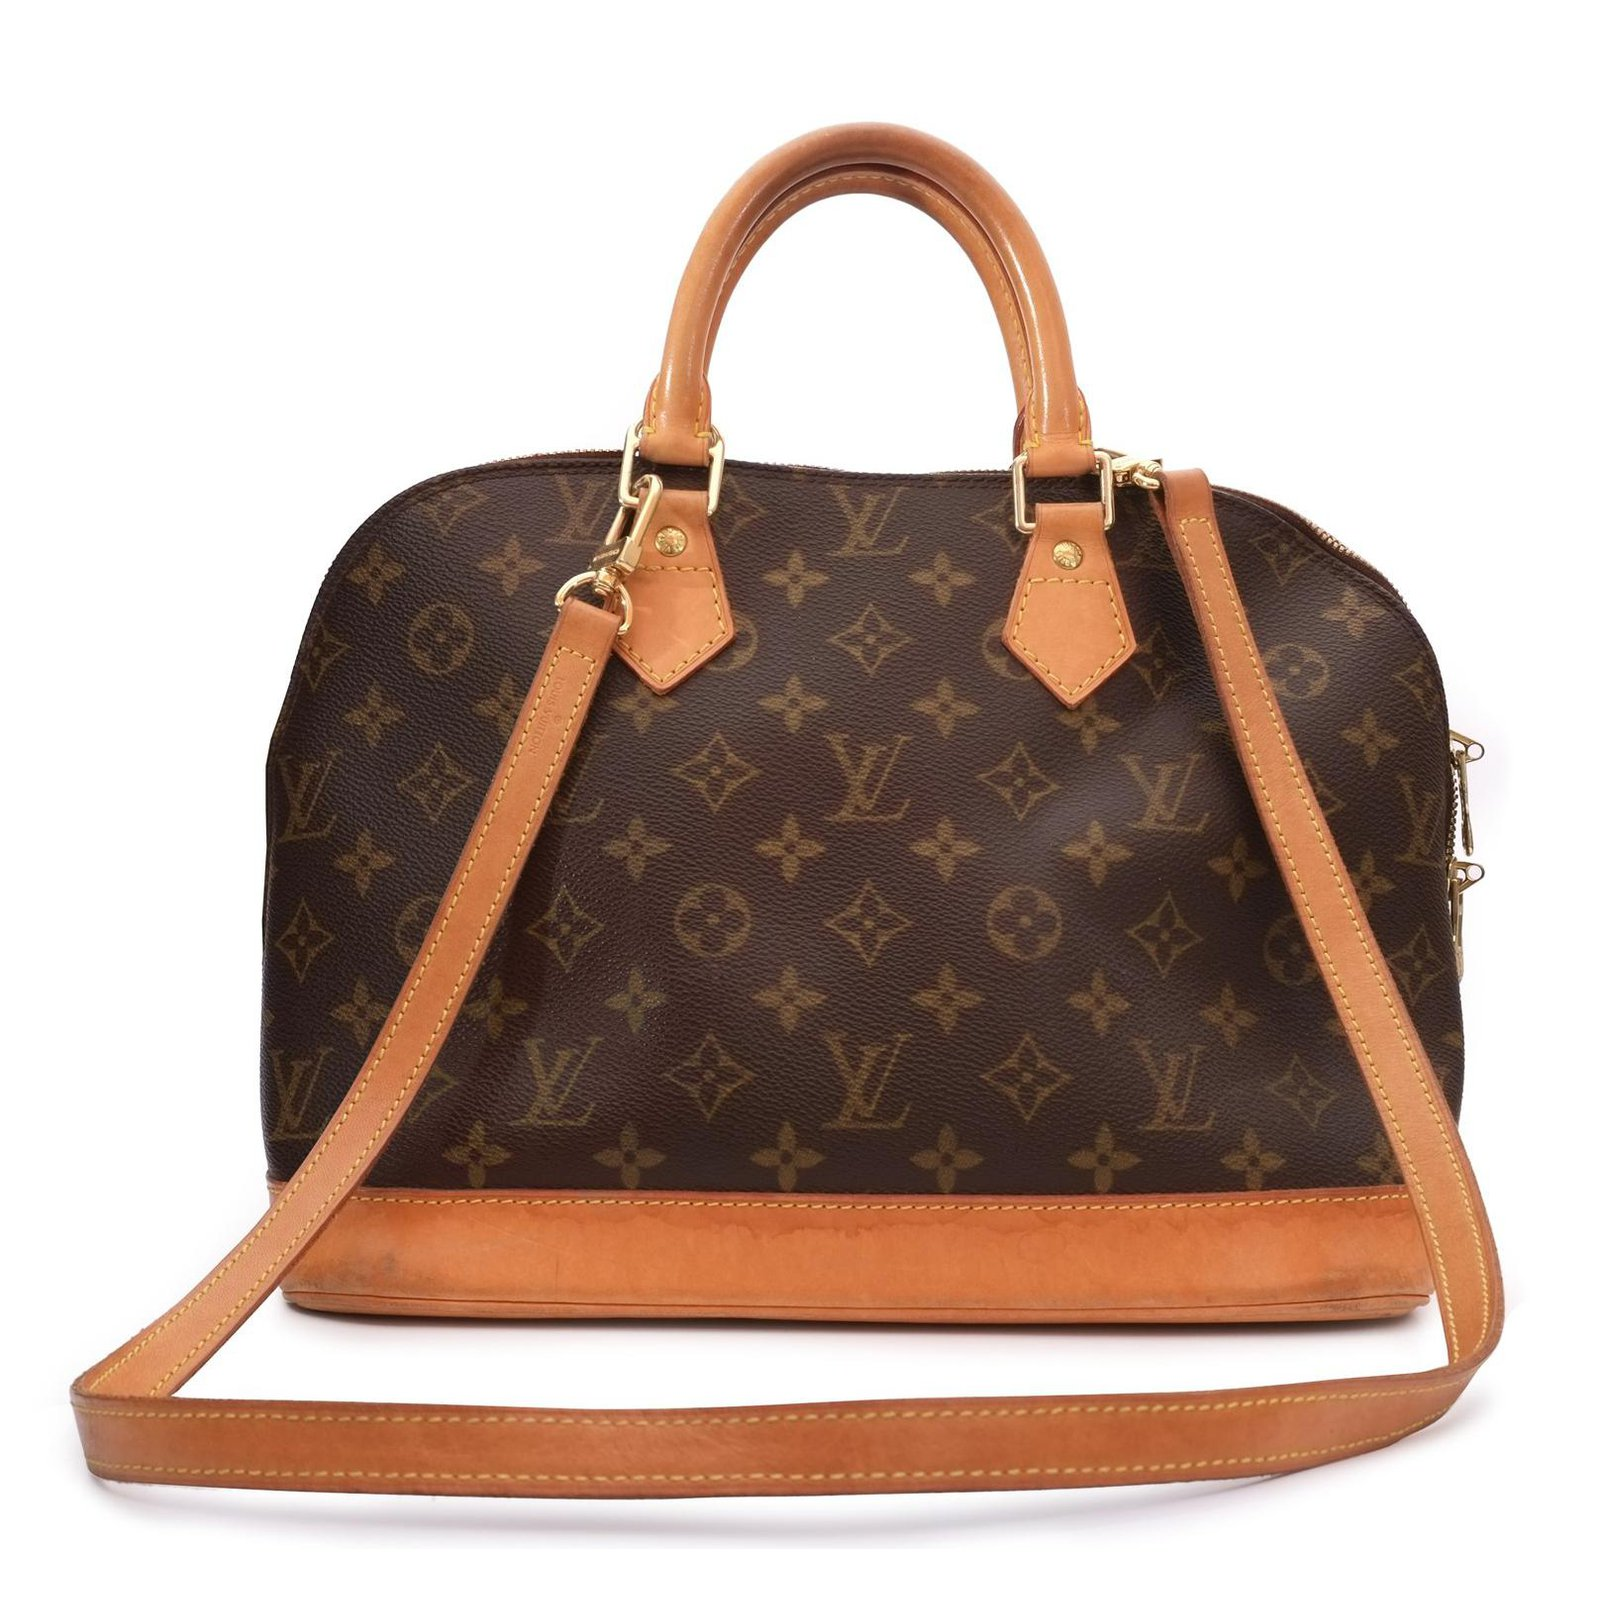 a0399e561c3d Louis Vuitton Louis Vuitton Alma Monogrammed shoulder bag in good  condition! Handbags Leather